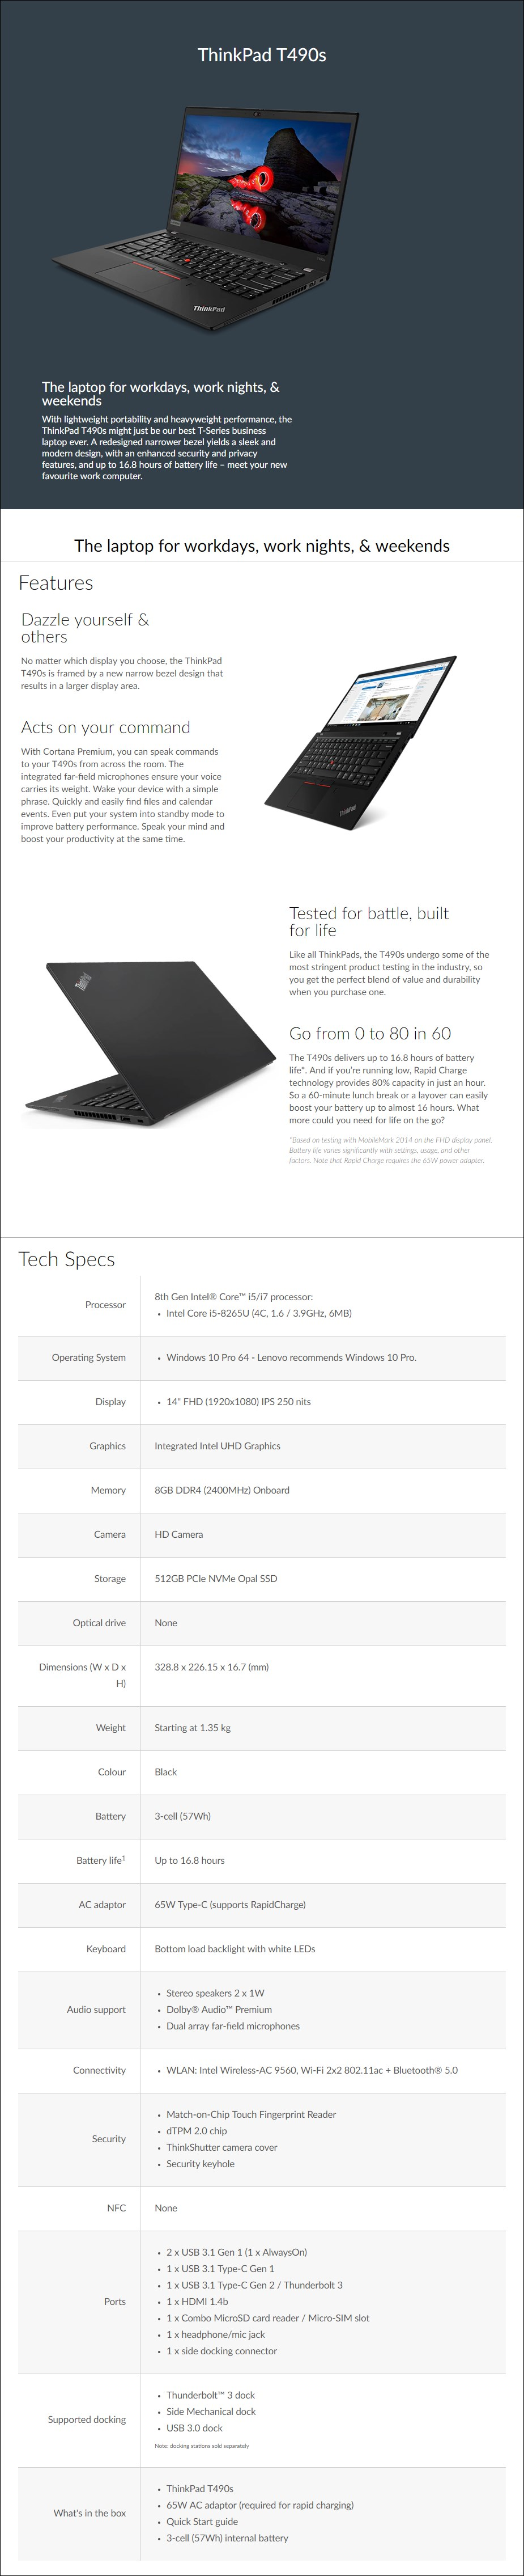 "Lenovo ThinkPad T490s 14"" Laptop i5-8265U 8GB 512GB SSD W10P - Overview 1"